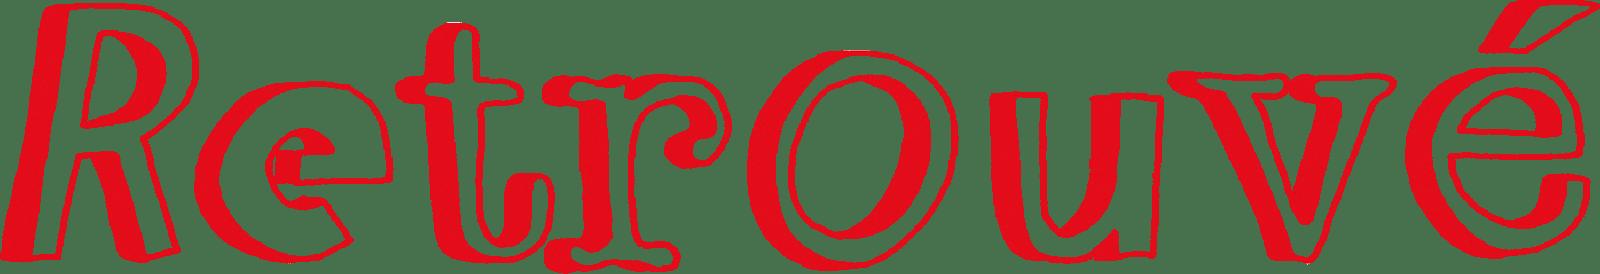 ret_logo_desktop.png